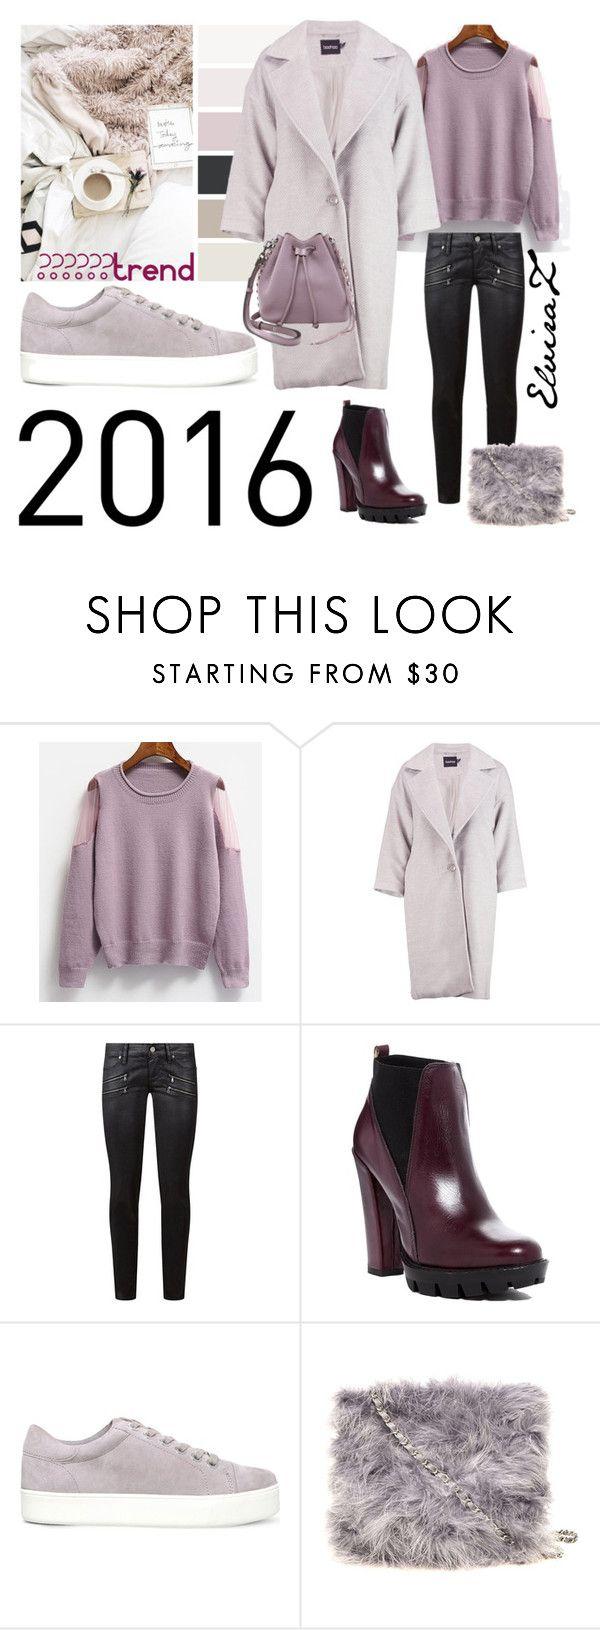 """best trend"" by elza76 on Polyvore featuring мода, Boohoo, Paige Denim, Charles David, Carvela, Dorothy Perkins и Rebecca Minkoff"